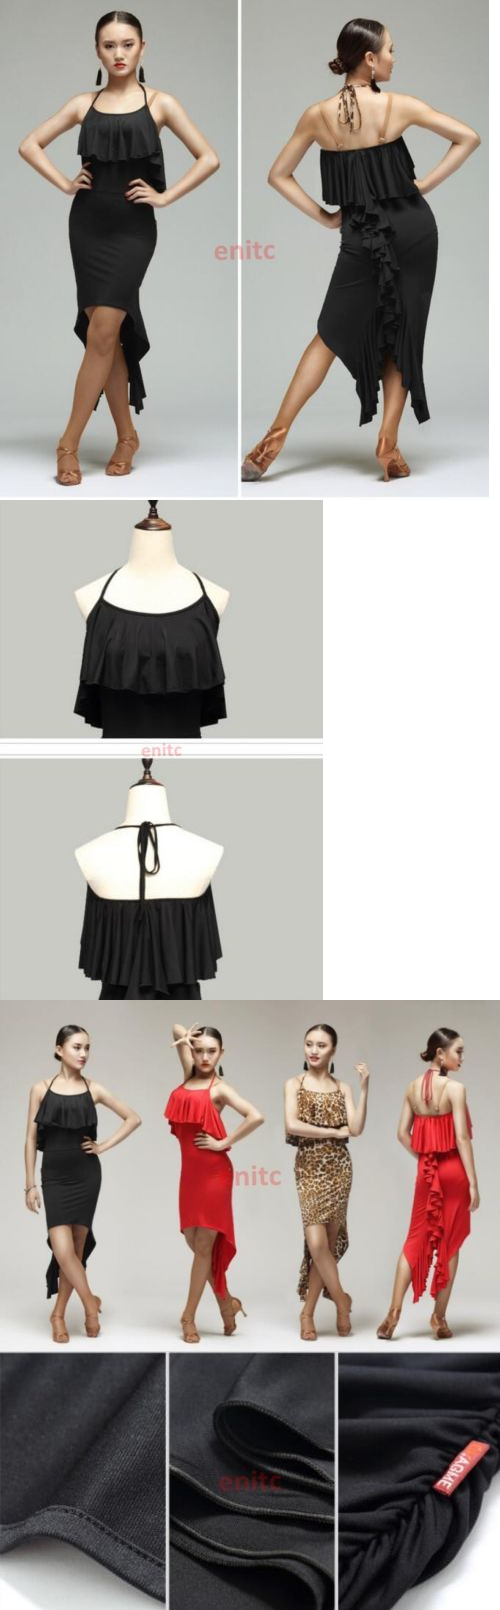 Ballroom 152361: New Latin Braces Skirt Slim Dance Dress Cha Cha Samba Rumba Ballroom Dancing -> BUY IT NOW ONLY: $31.68 on eBay!